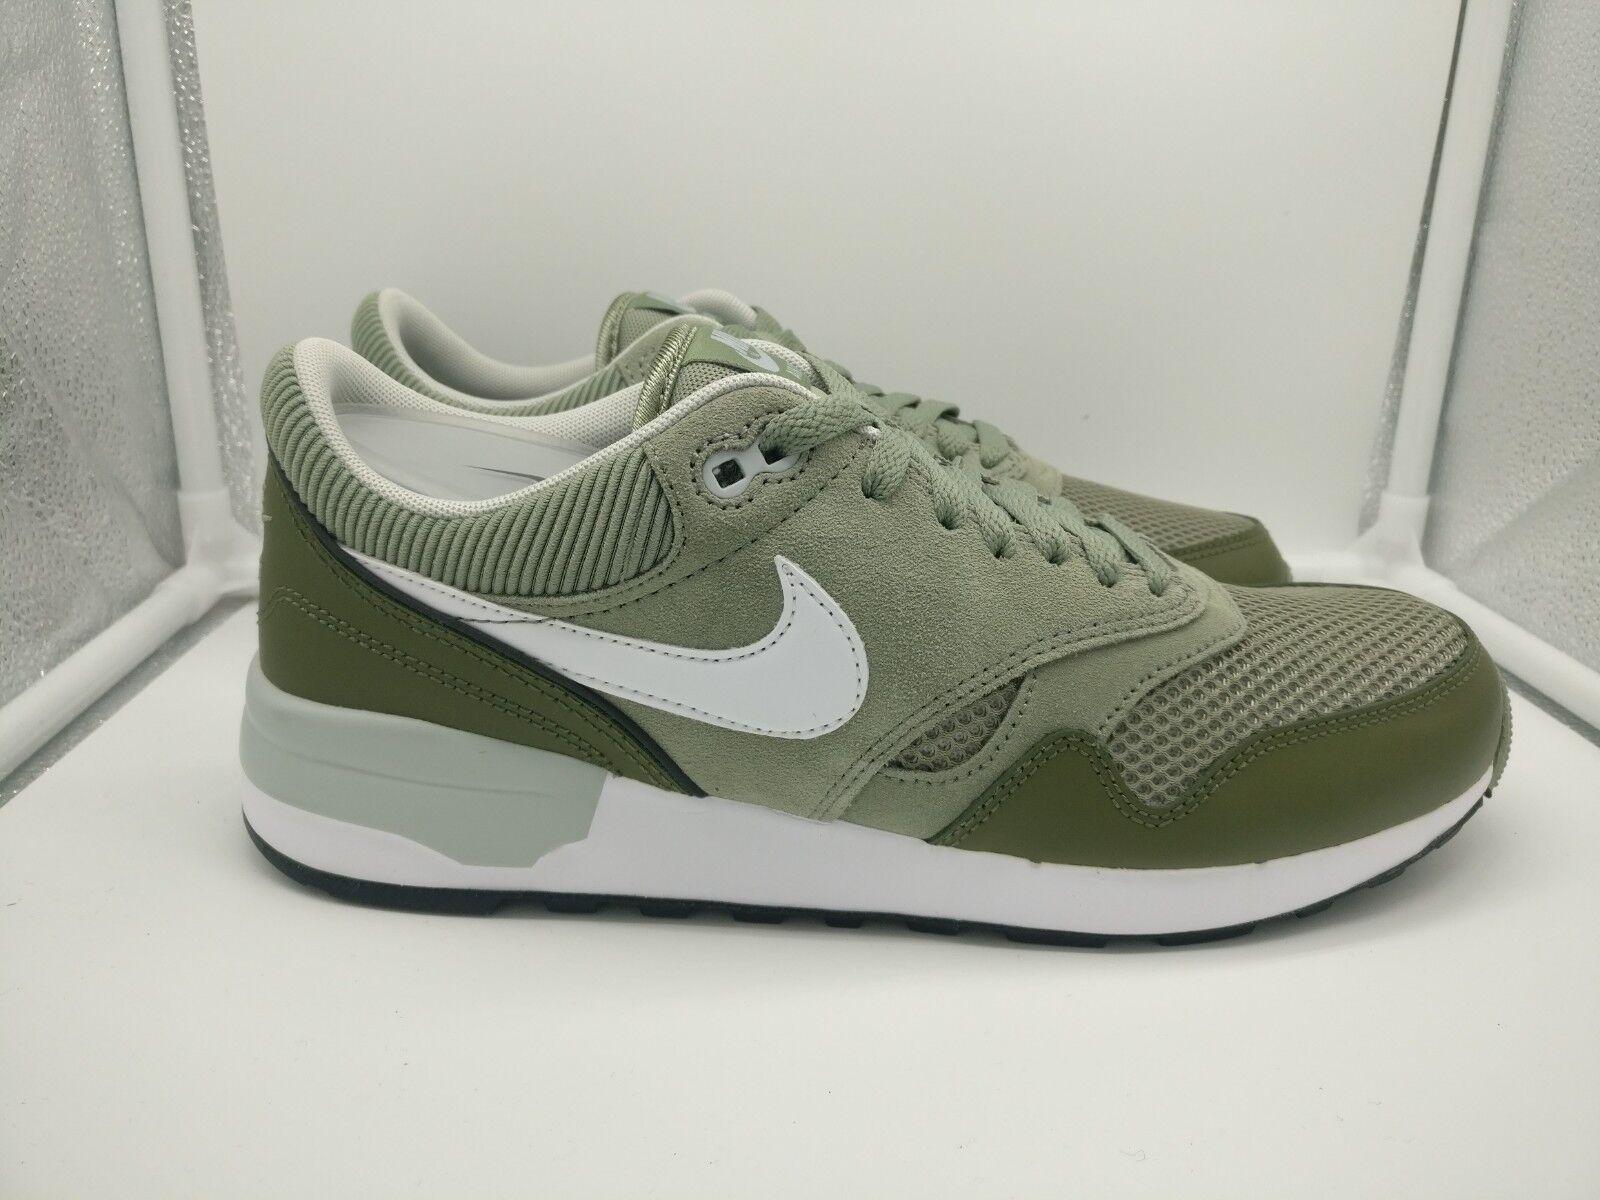 Nike Air Odyssey UK 7.5 Jade Stone Grün Weiß 652989-301